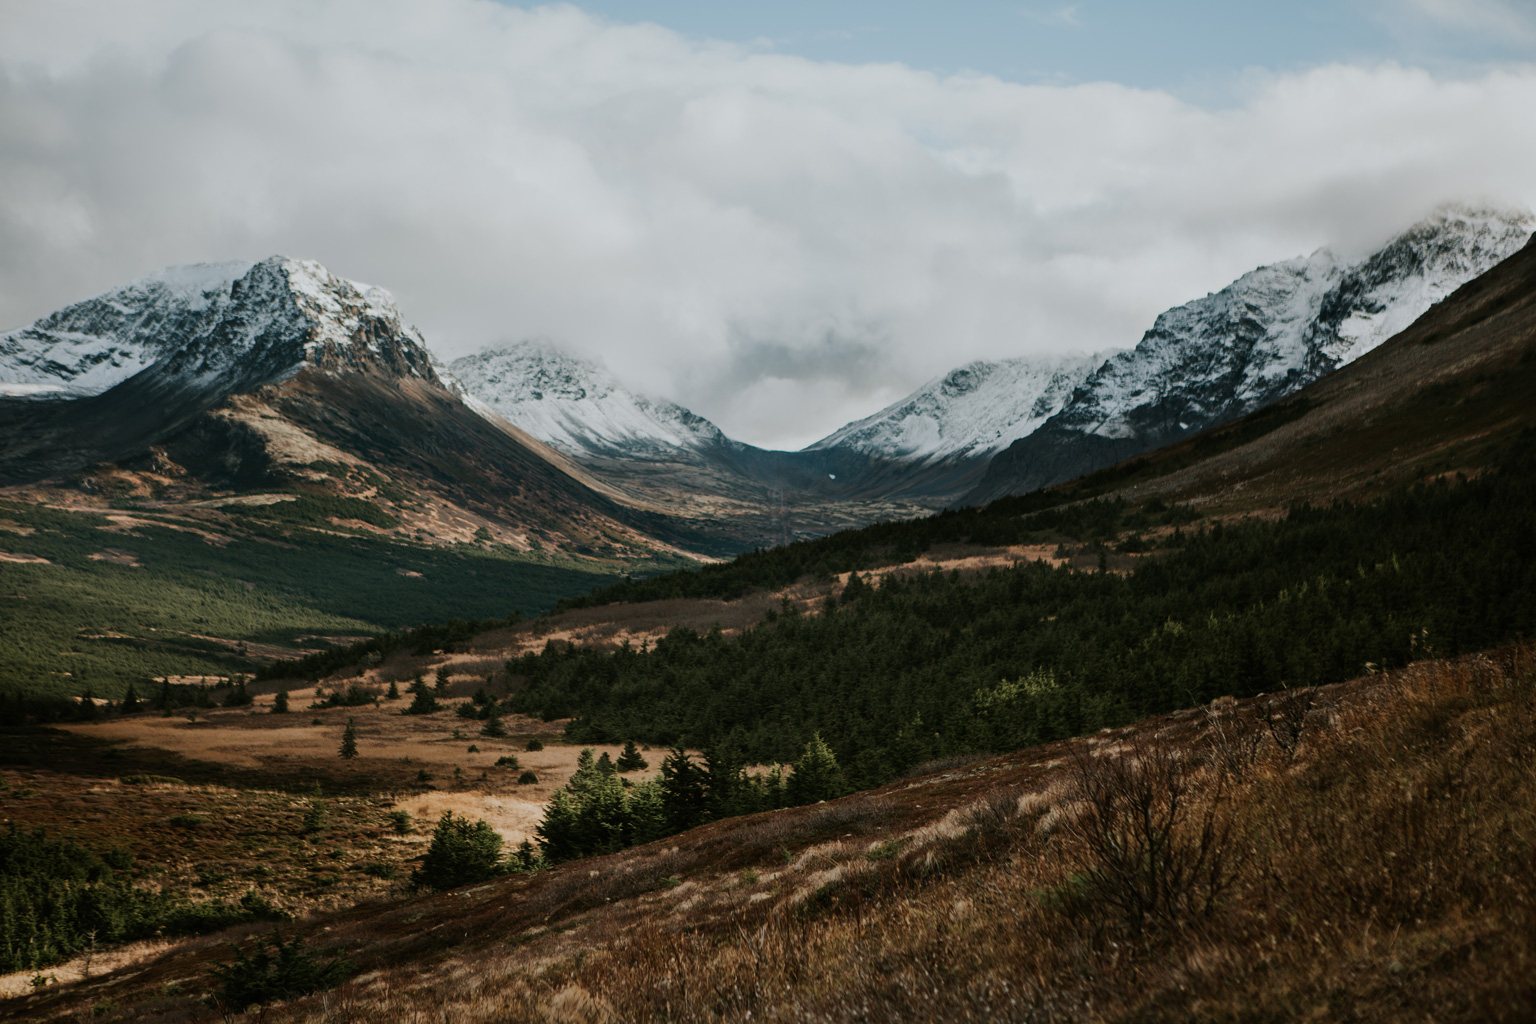 CindyGiovagnoli_Anchorage_Alaska_Flattop_mountain_hike_snocapped-008.jpg